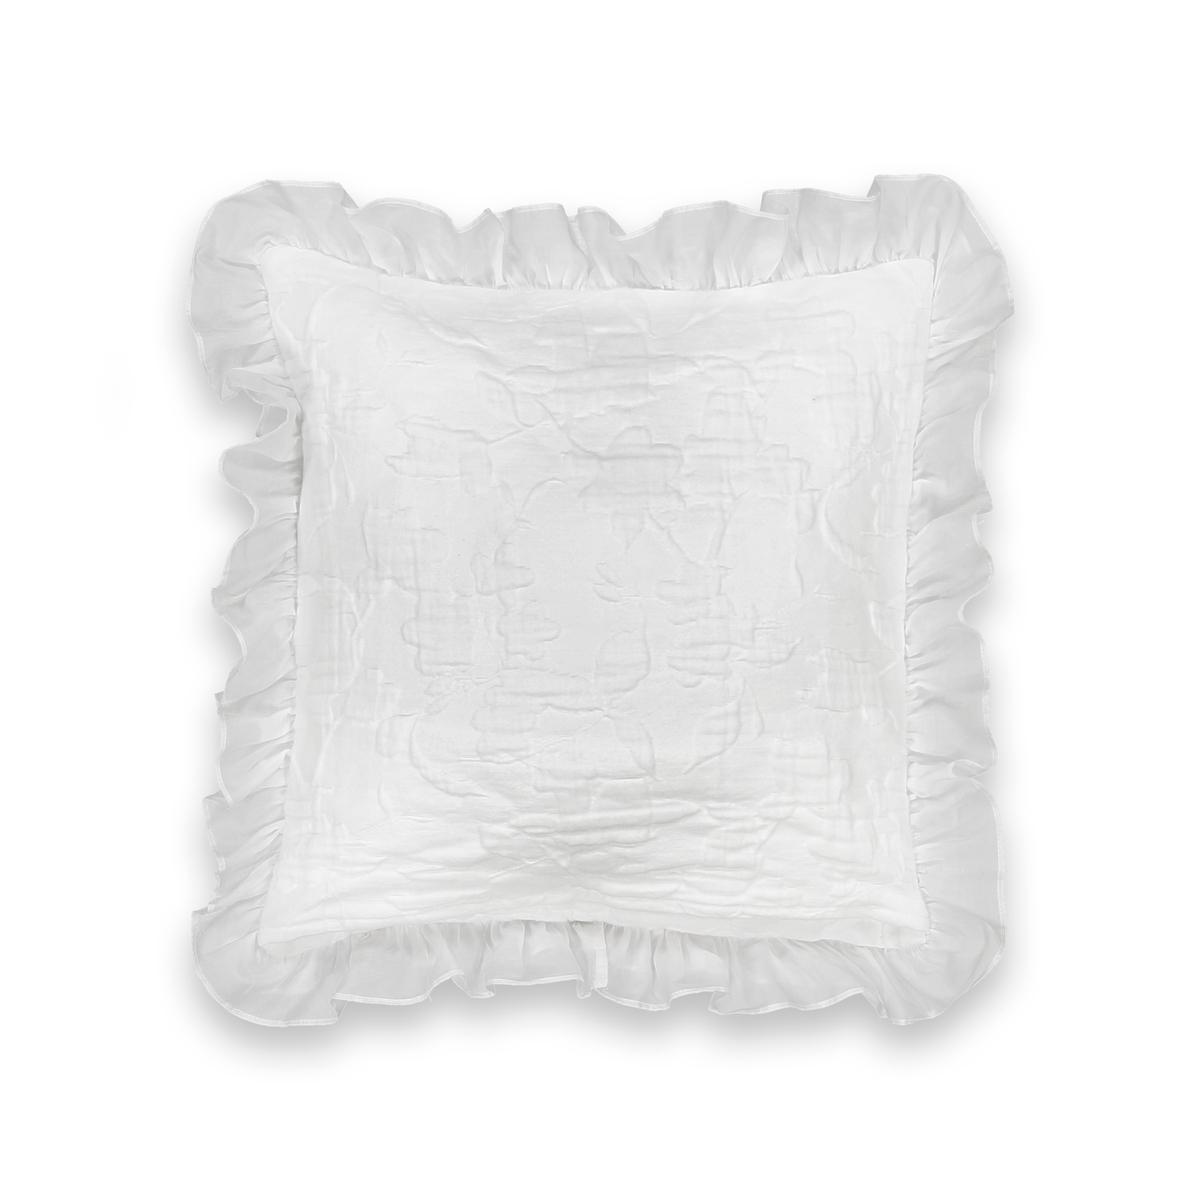 Чехол La Redoute На подушку или наволочка JARA 65 x 65 см белый чехол la redoute для подушки или наволочка однотонного цвета с помпонами riad 65 x 65 см розовый